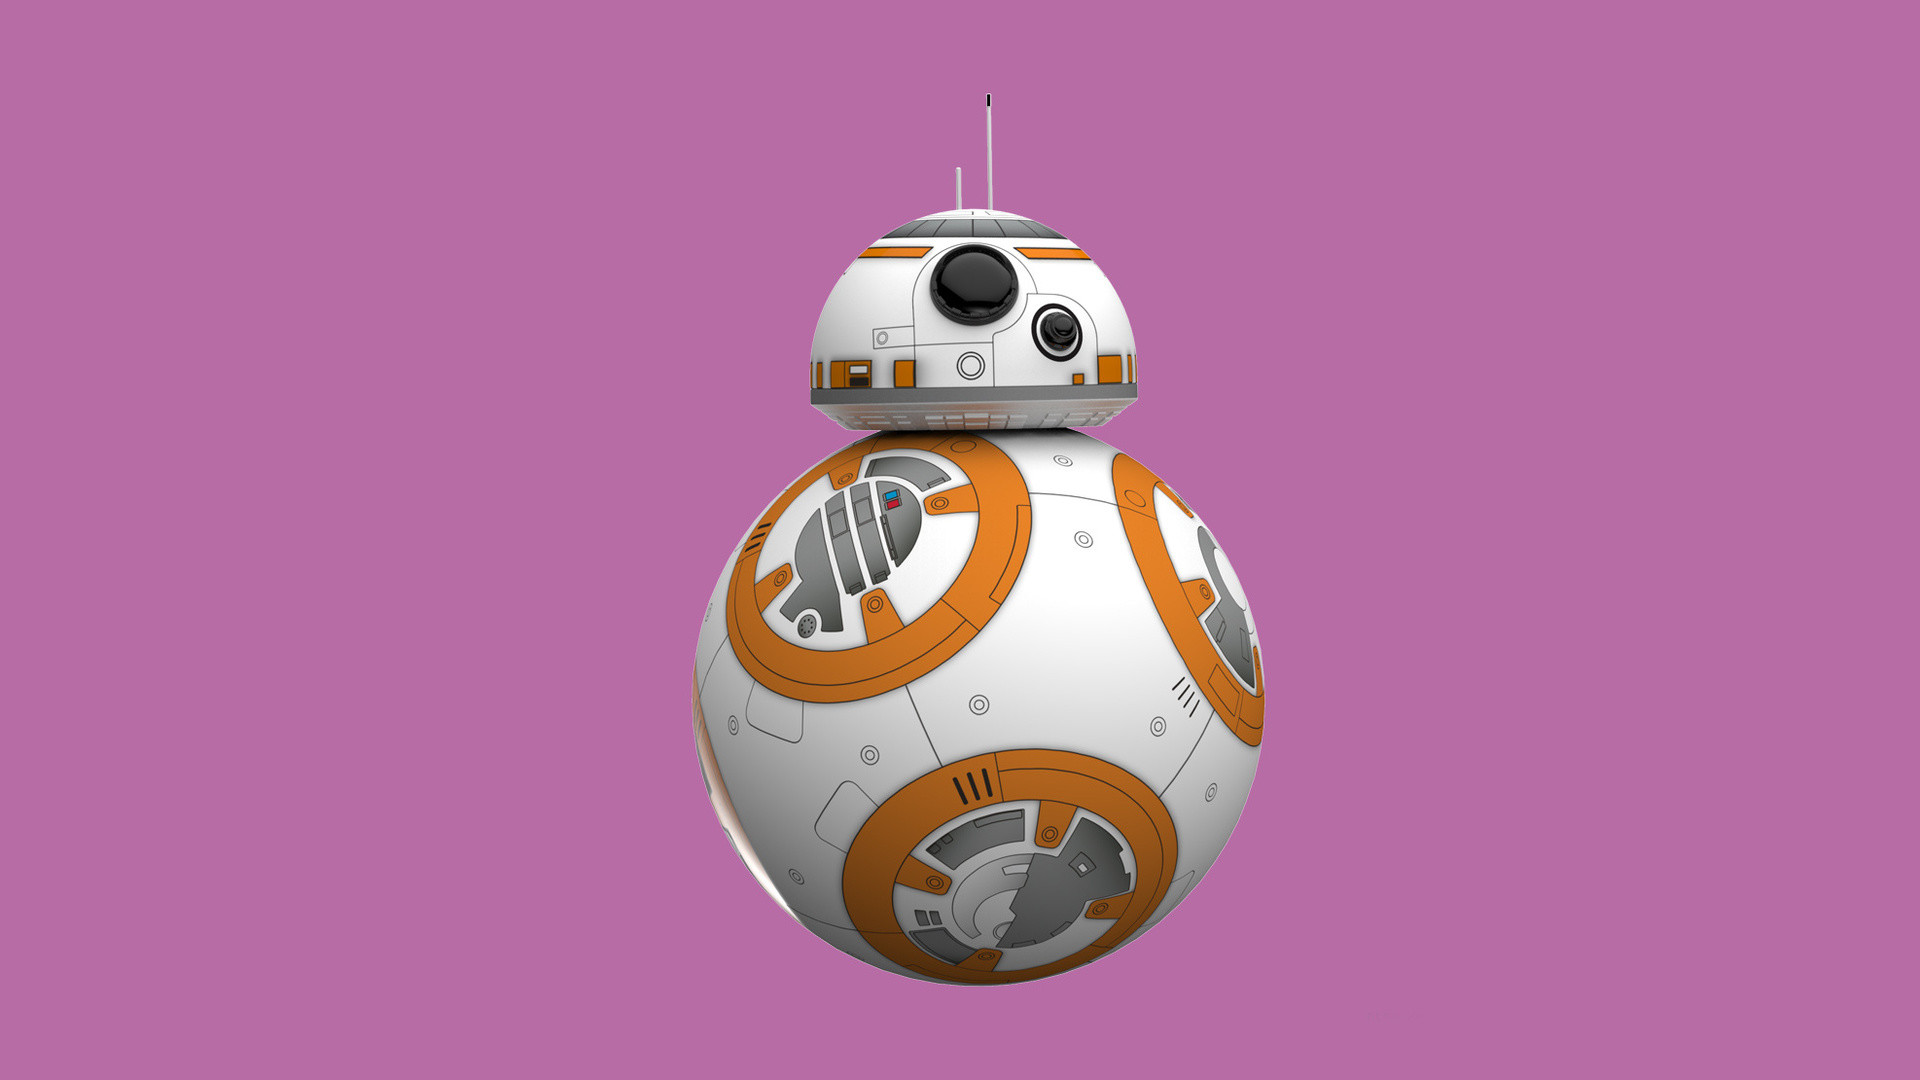 Robot, Robot Droid Bb8, Bb8, Star Wars, Star Wars The Force Awakens